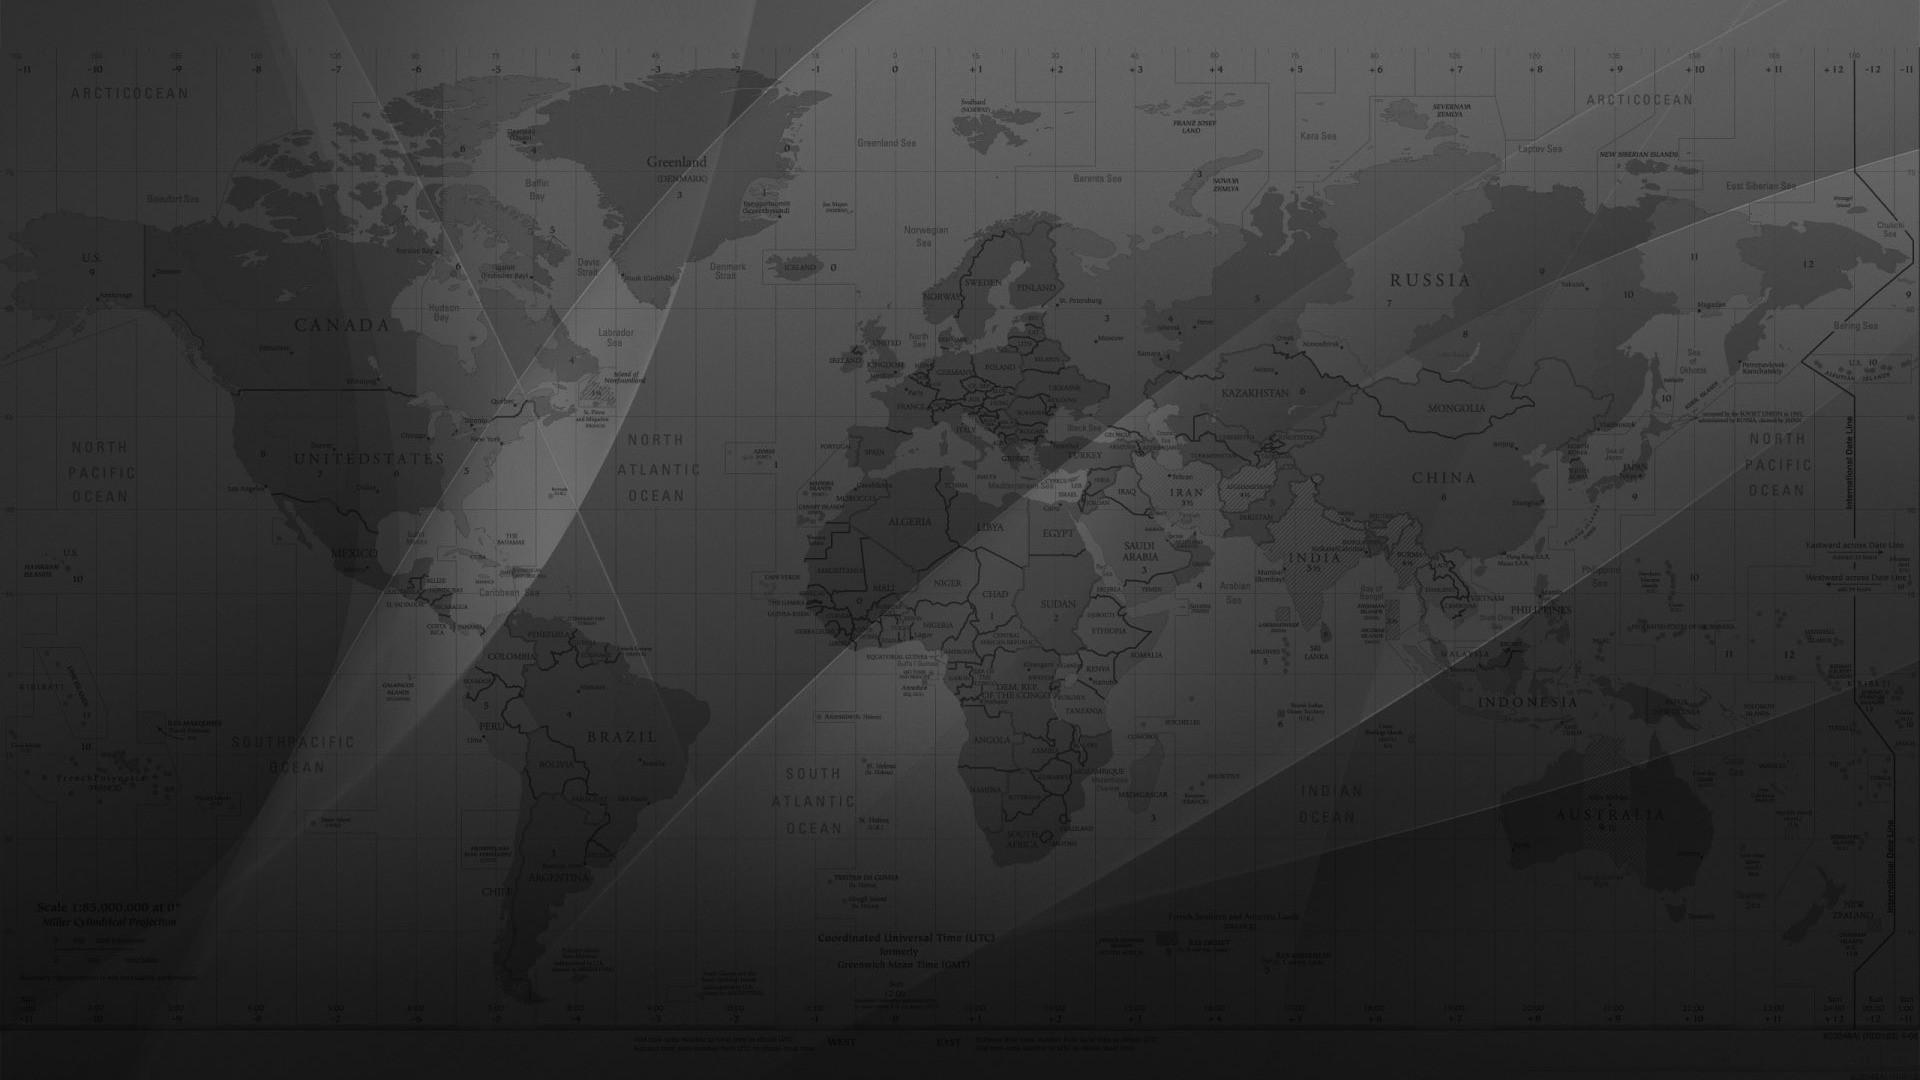 world map abstract hd wallpaper